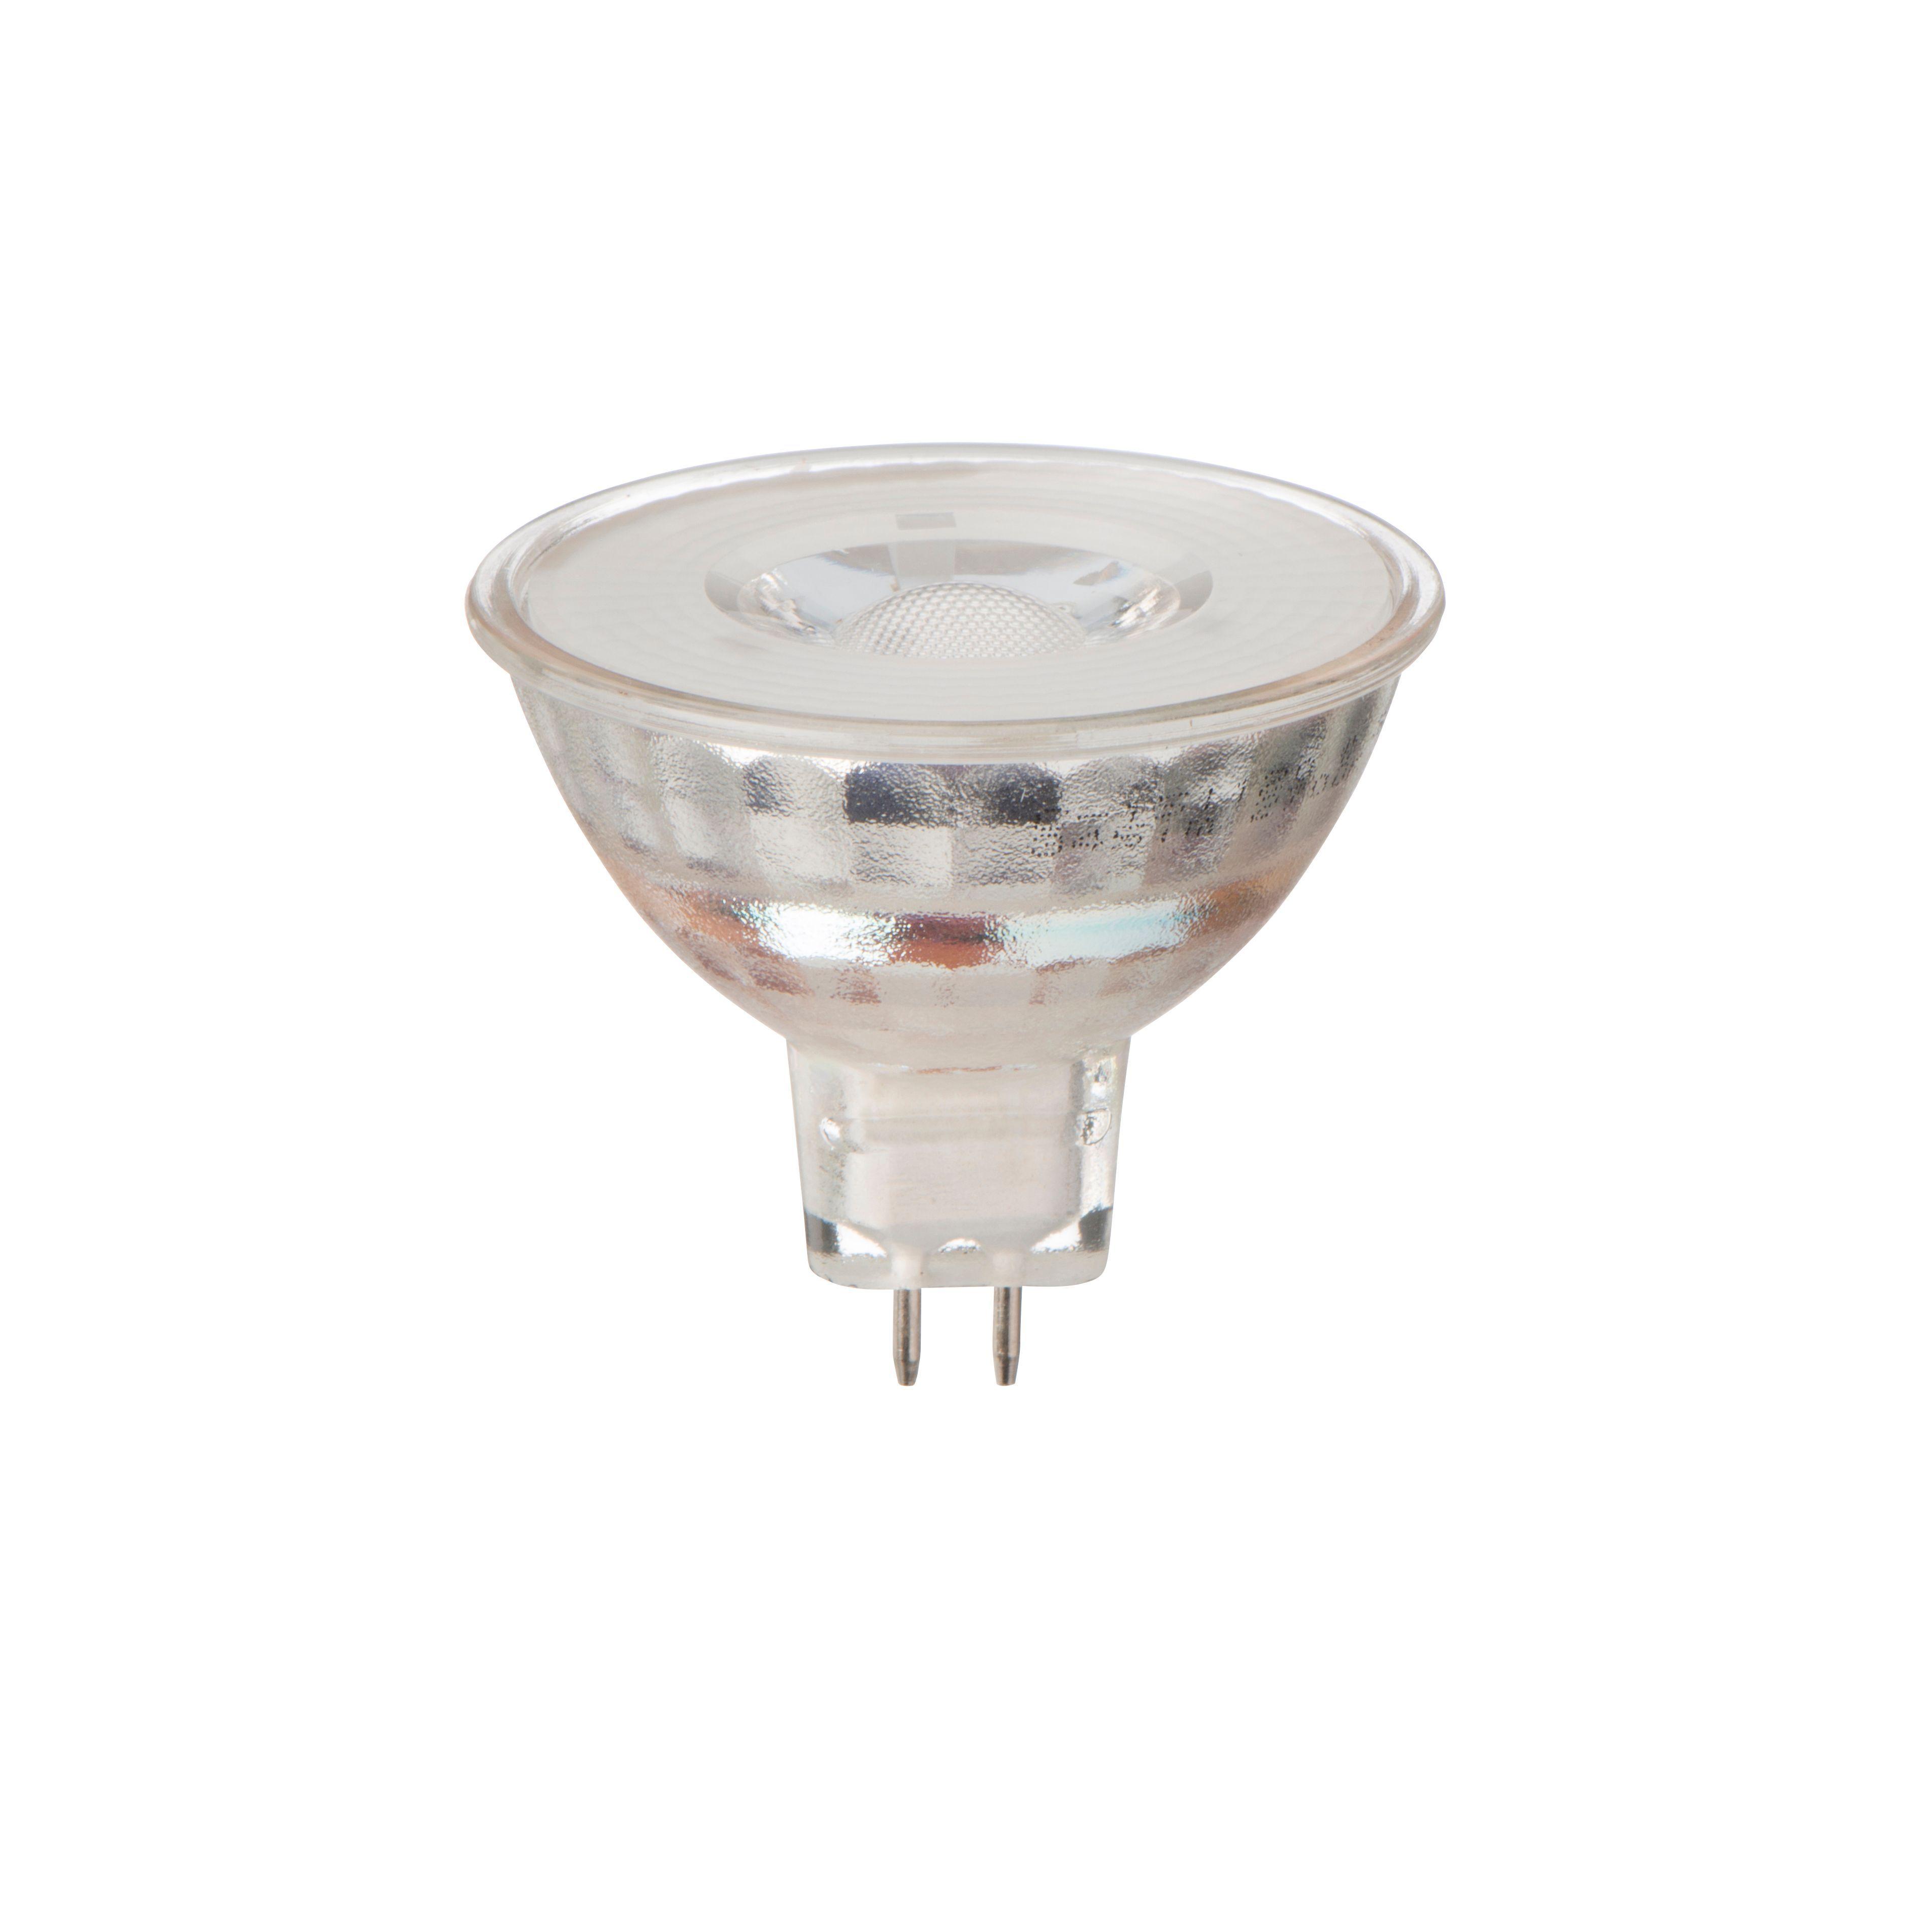 Diall Gu5.3 Mr16 345lm Led Reflector Light Bulb